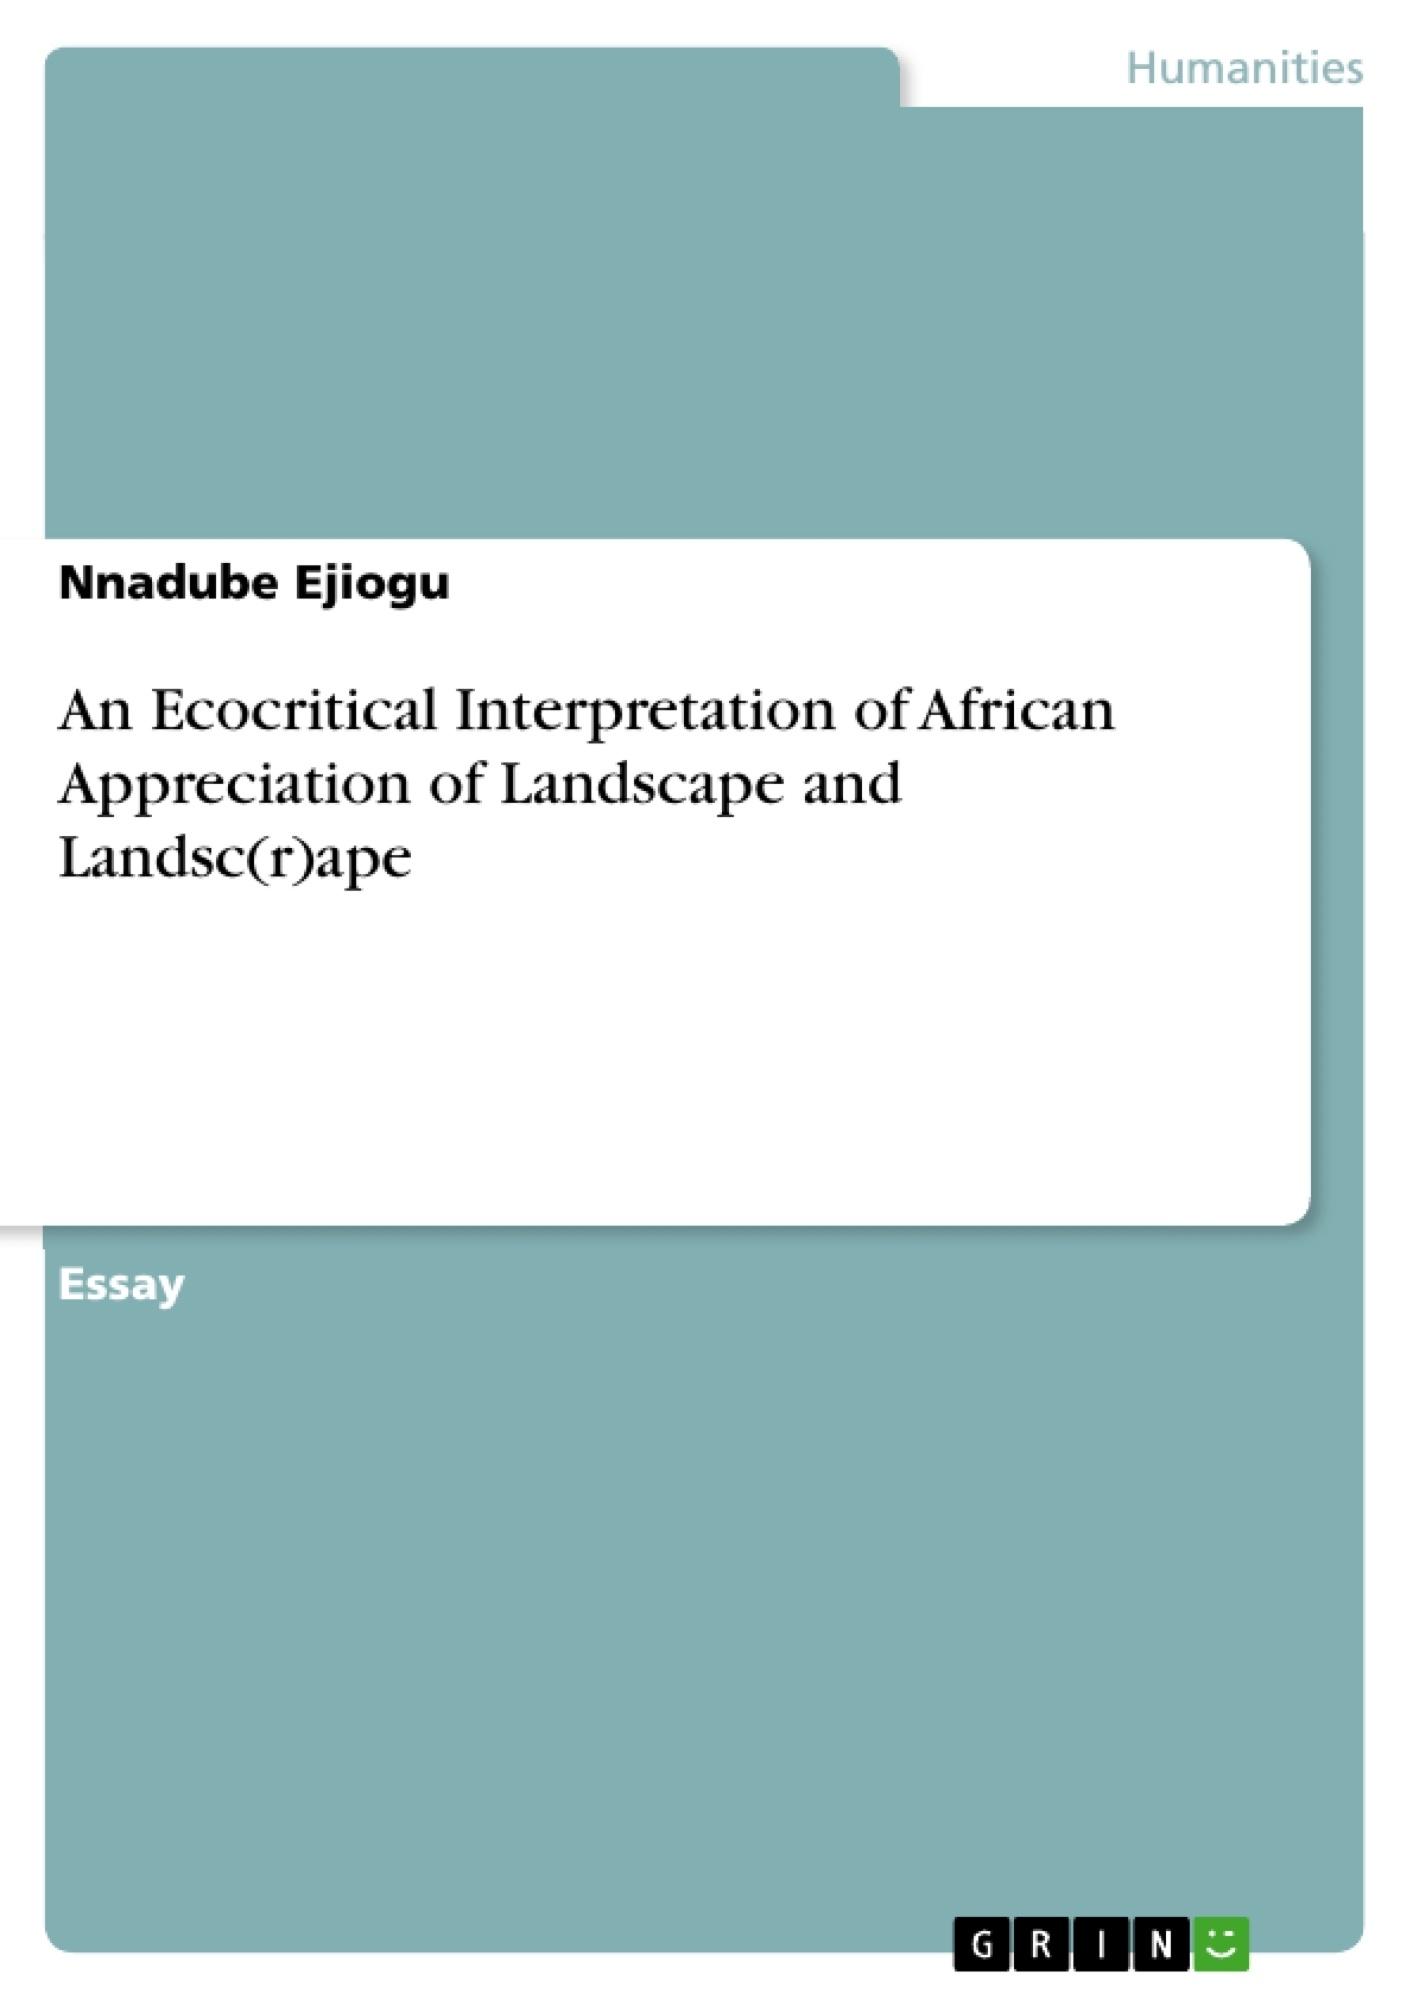 Title: An Ecocritical Interpretation of African Appreciation of Landscape and Landsc(r)ape